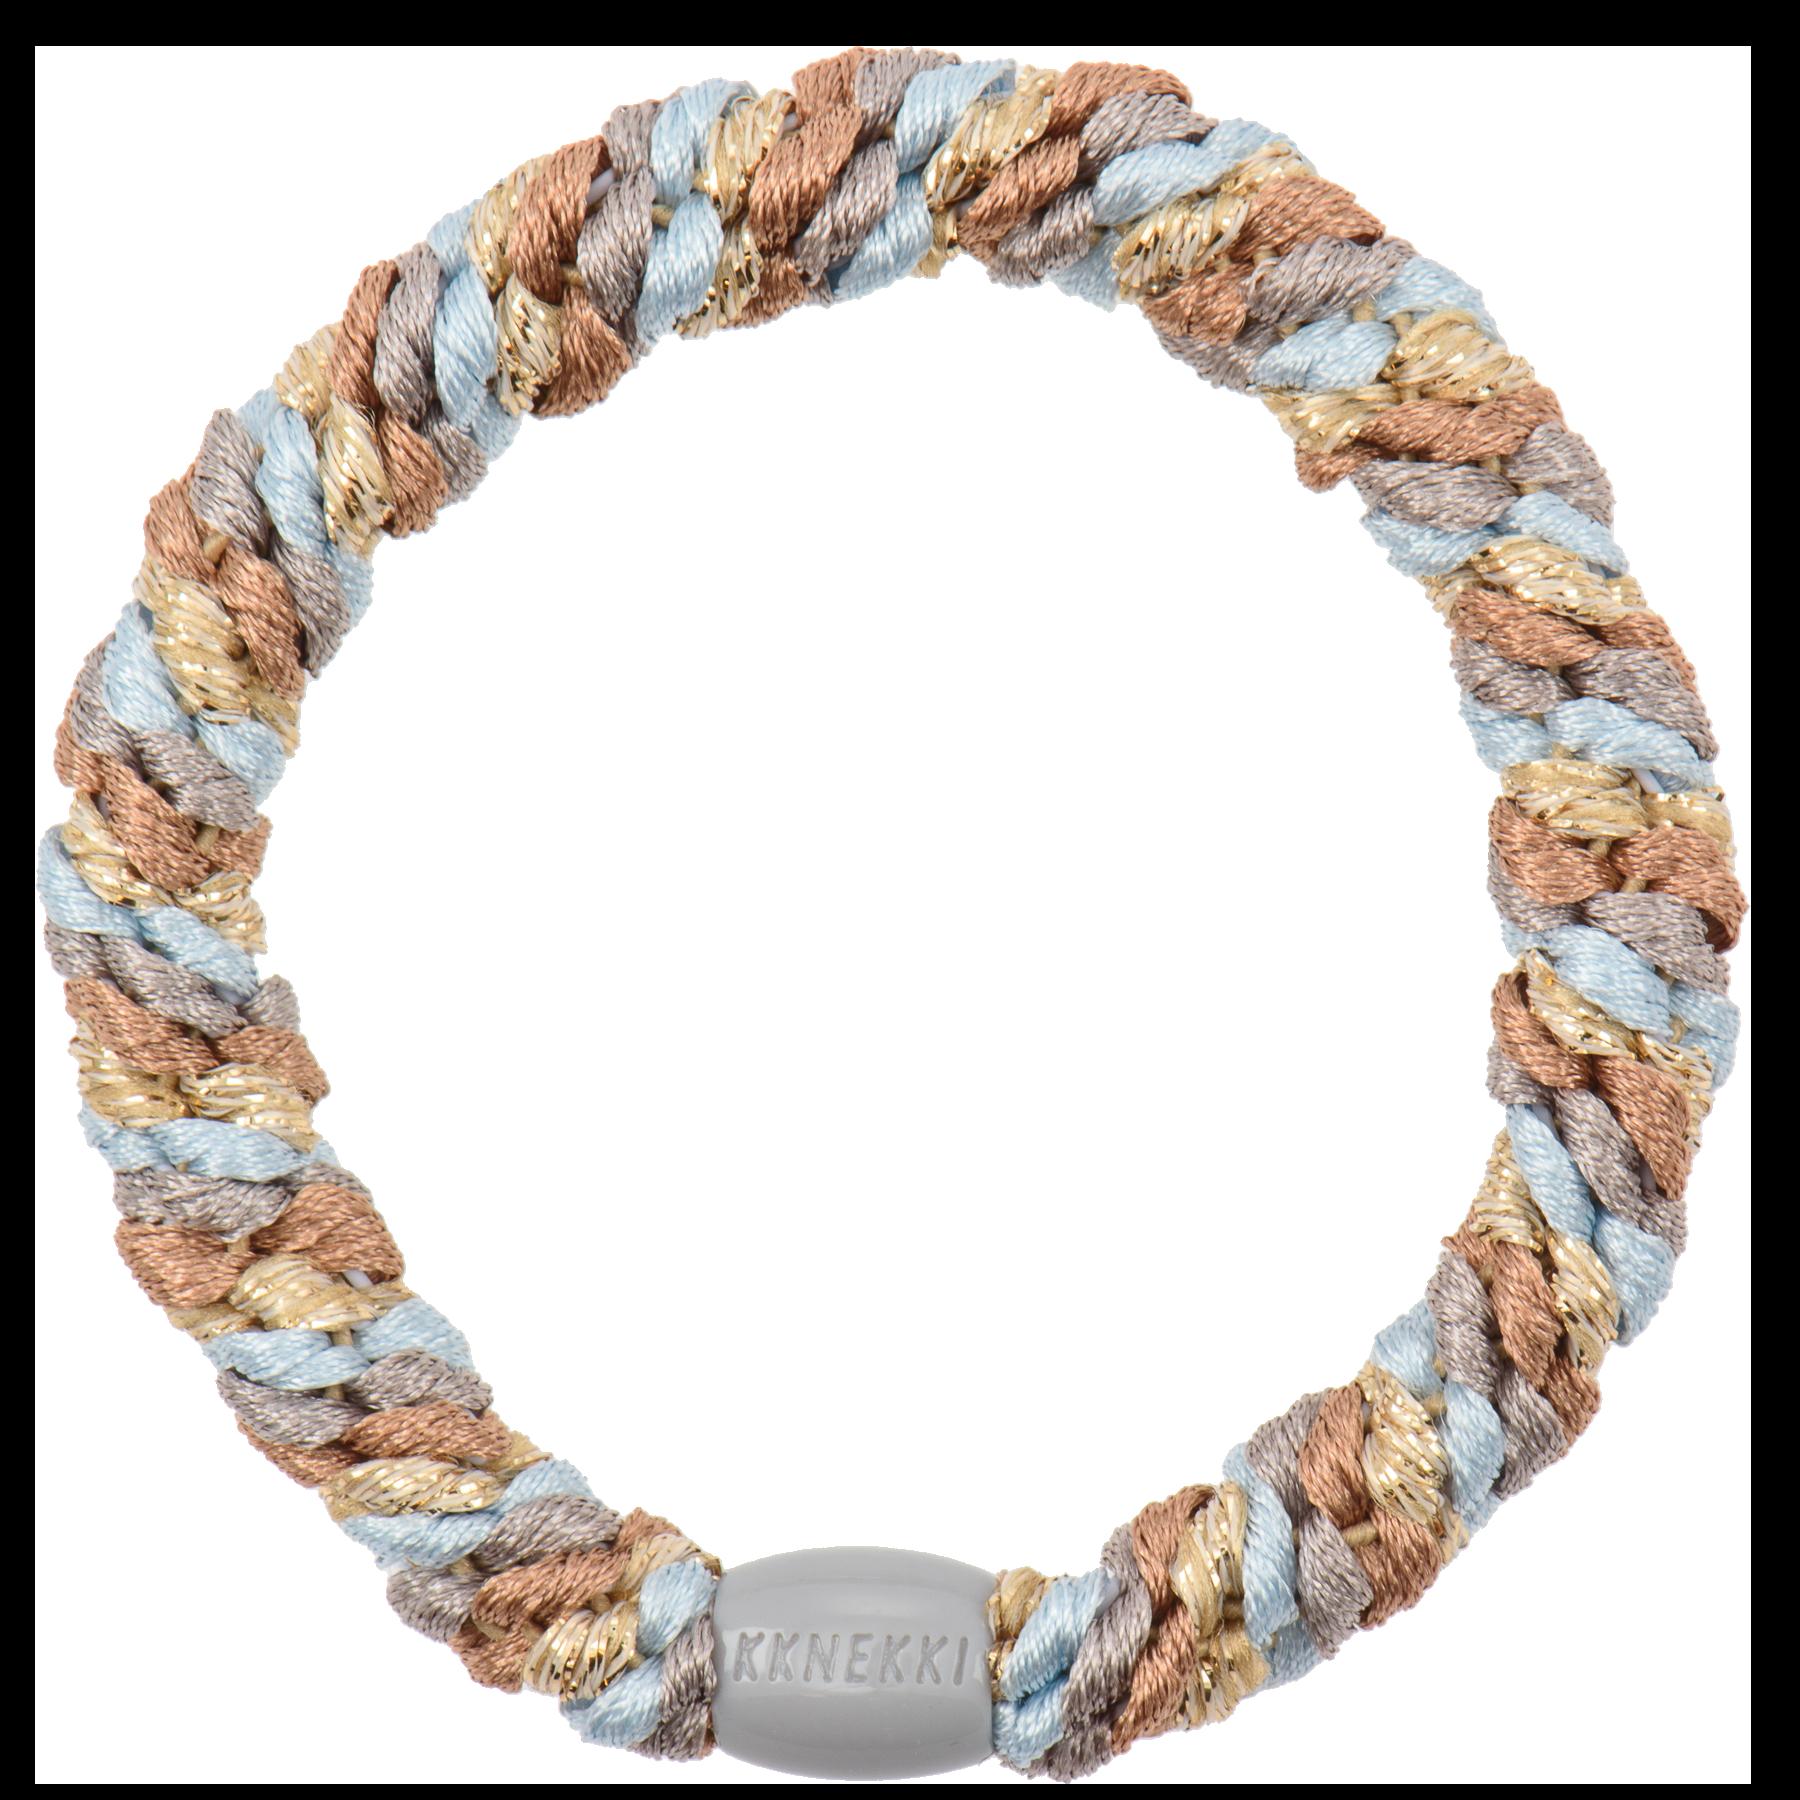 Haargummi / Armband - Nougat Baby Blue Mix 53644 - KKNEKKI